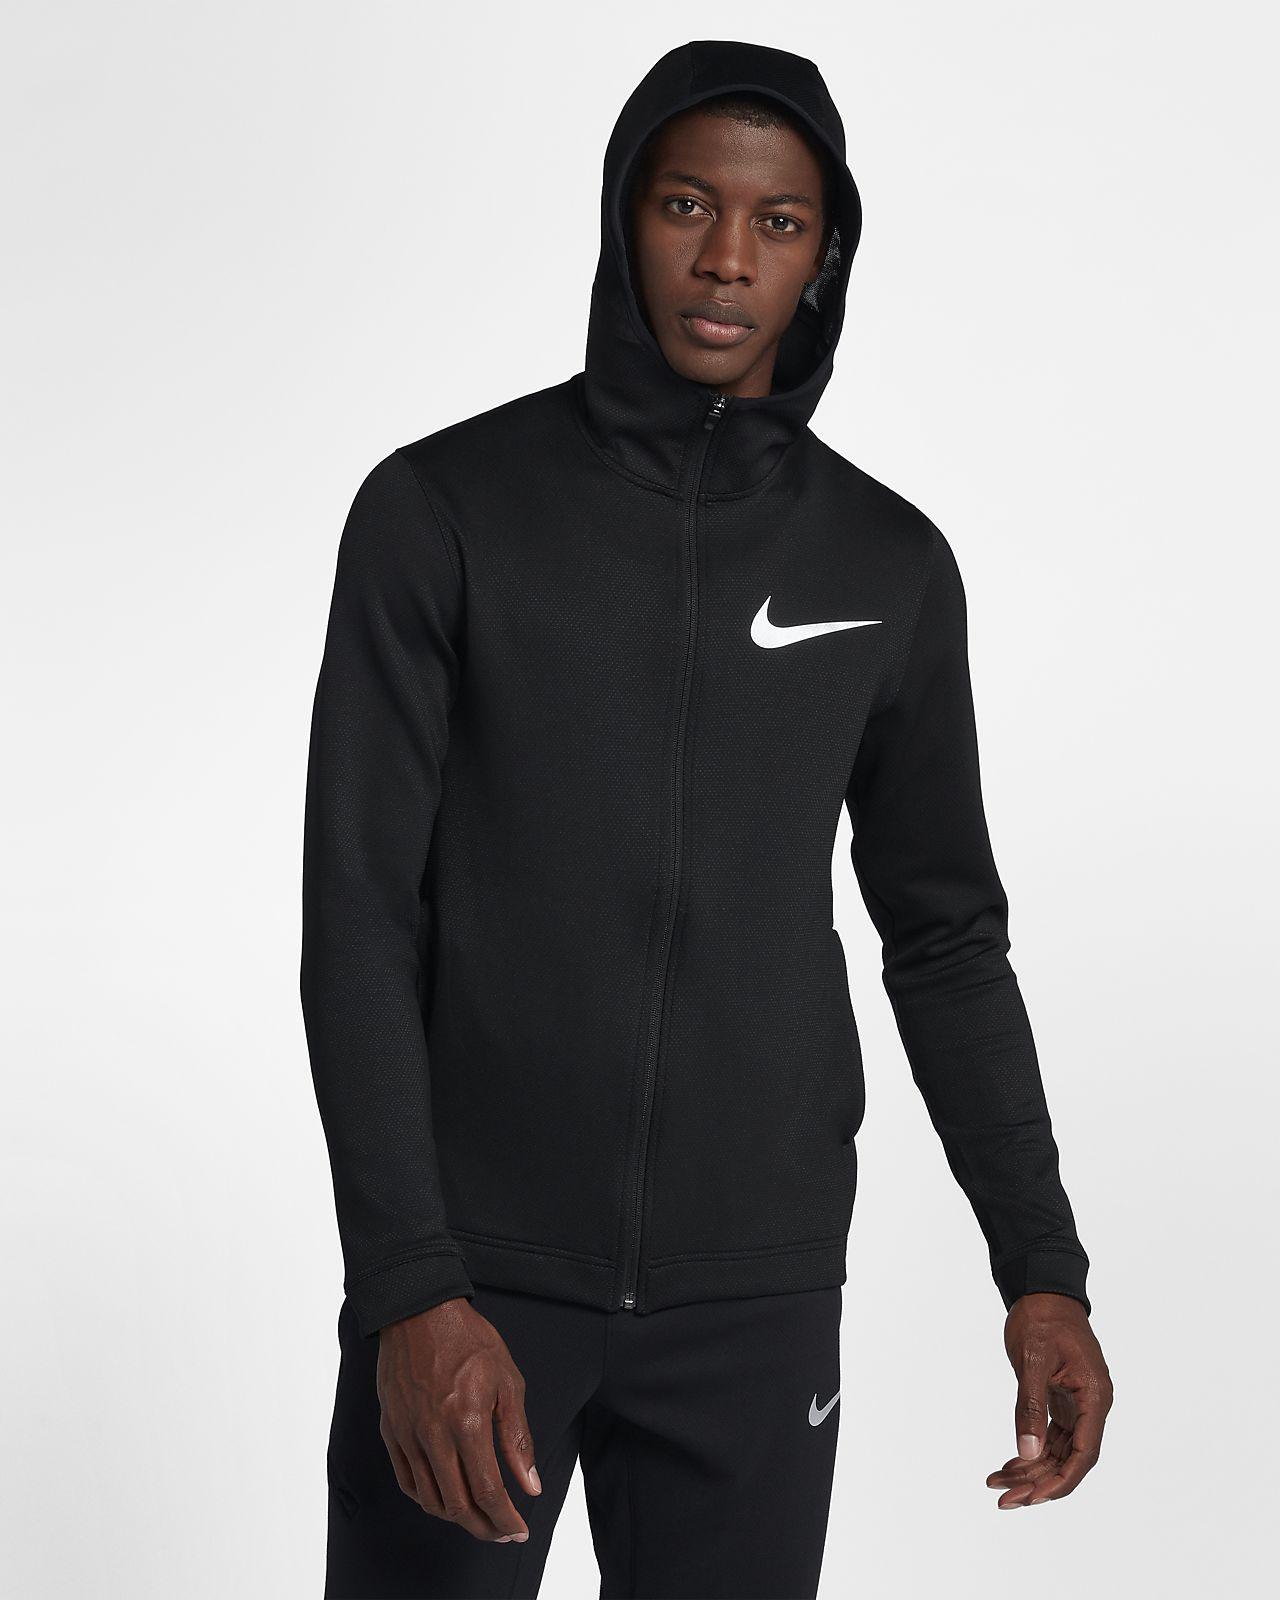 3ae5c394ac2 Nike Therma Flex Showtime Men s Full-Zip Basketball Hoodie. Nike.com GB